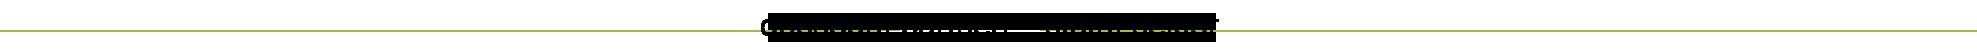 web_obch_partneri_statni_sektor